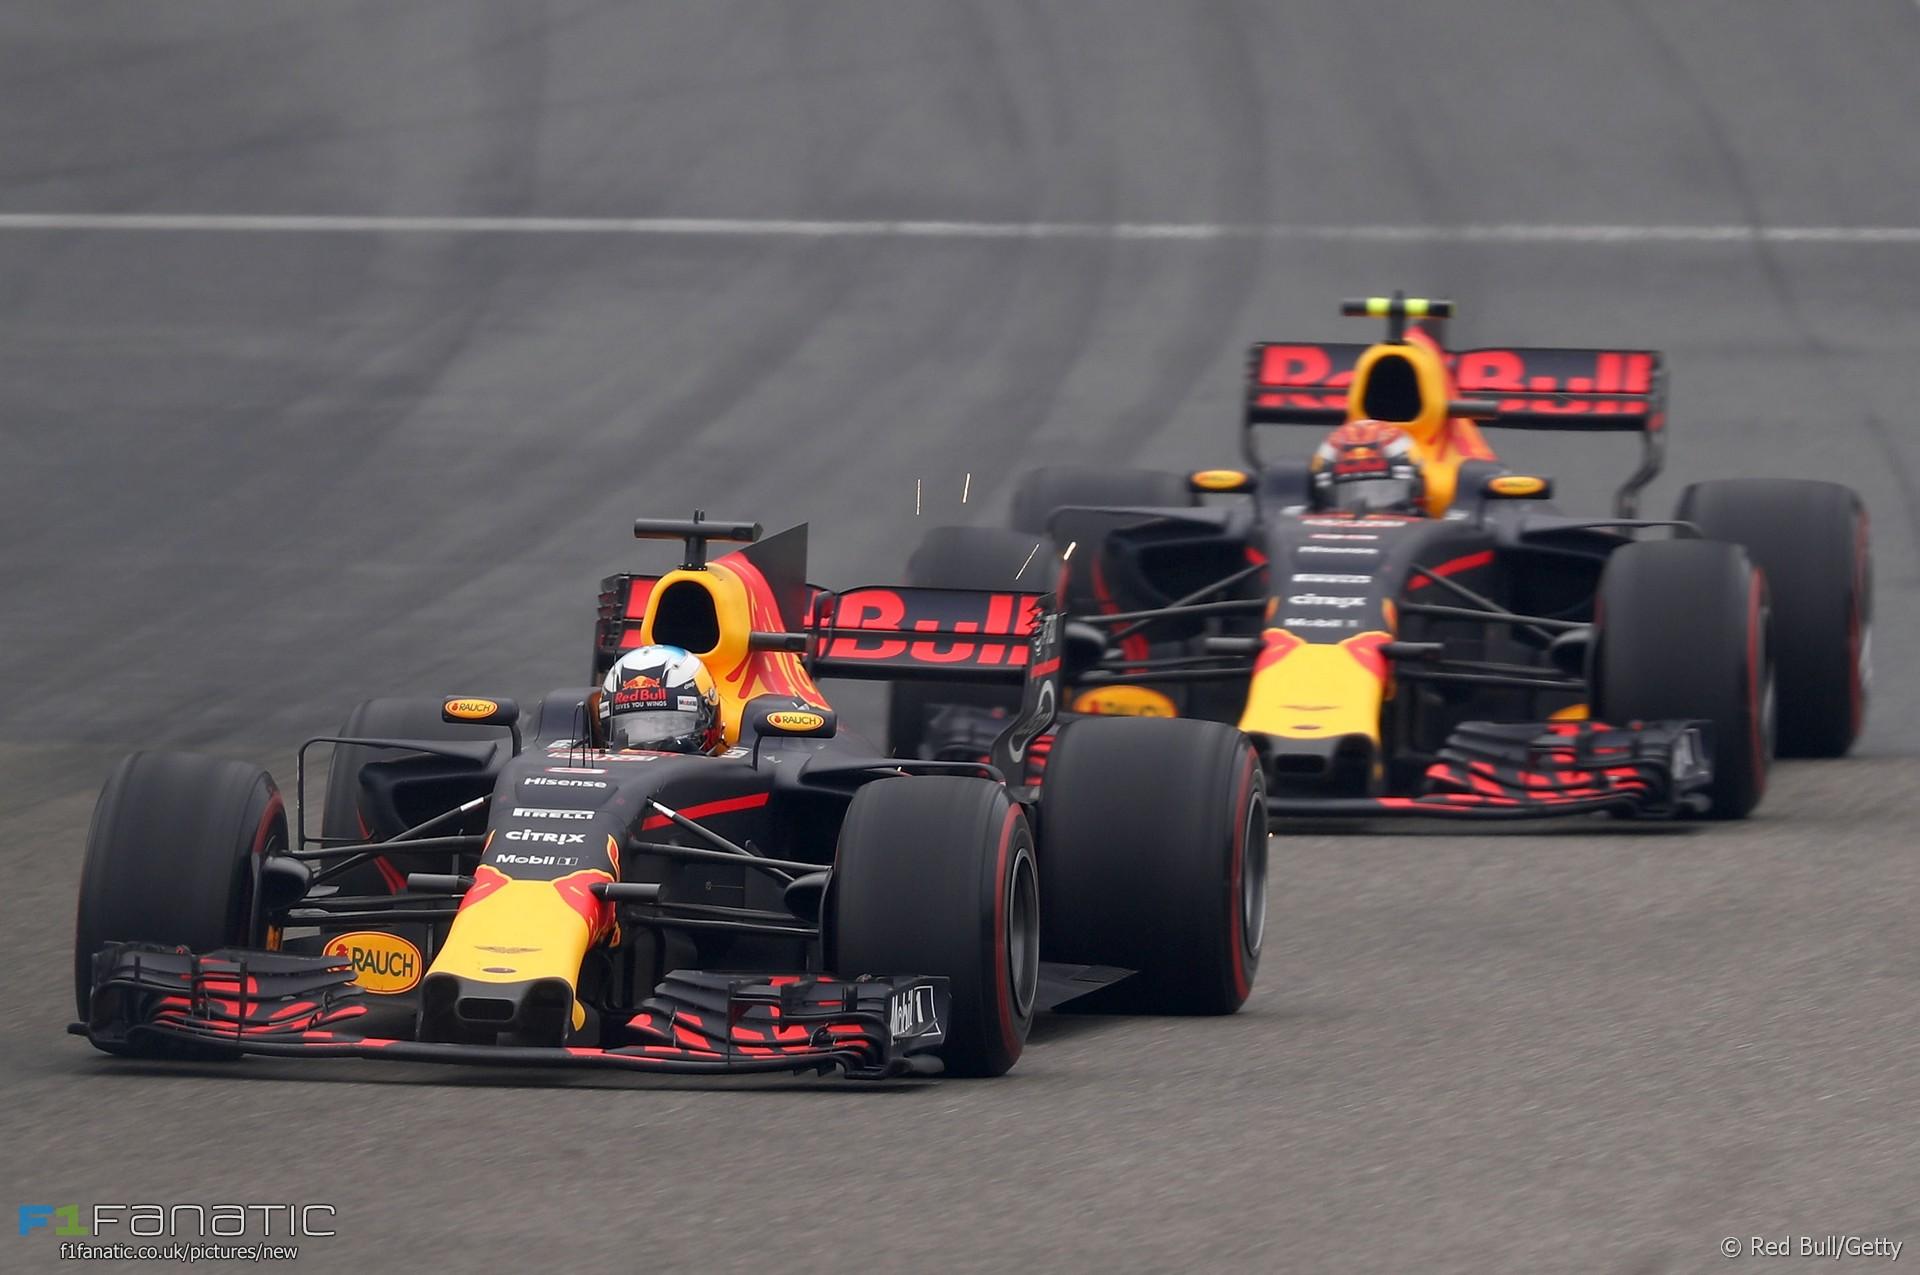 Daniel Ricciardo, Max Verstappen, Red Bull, Shanghai International Circuit, 2017